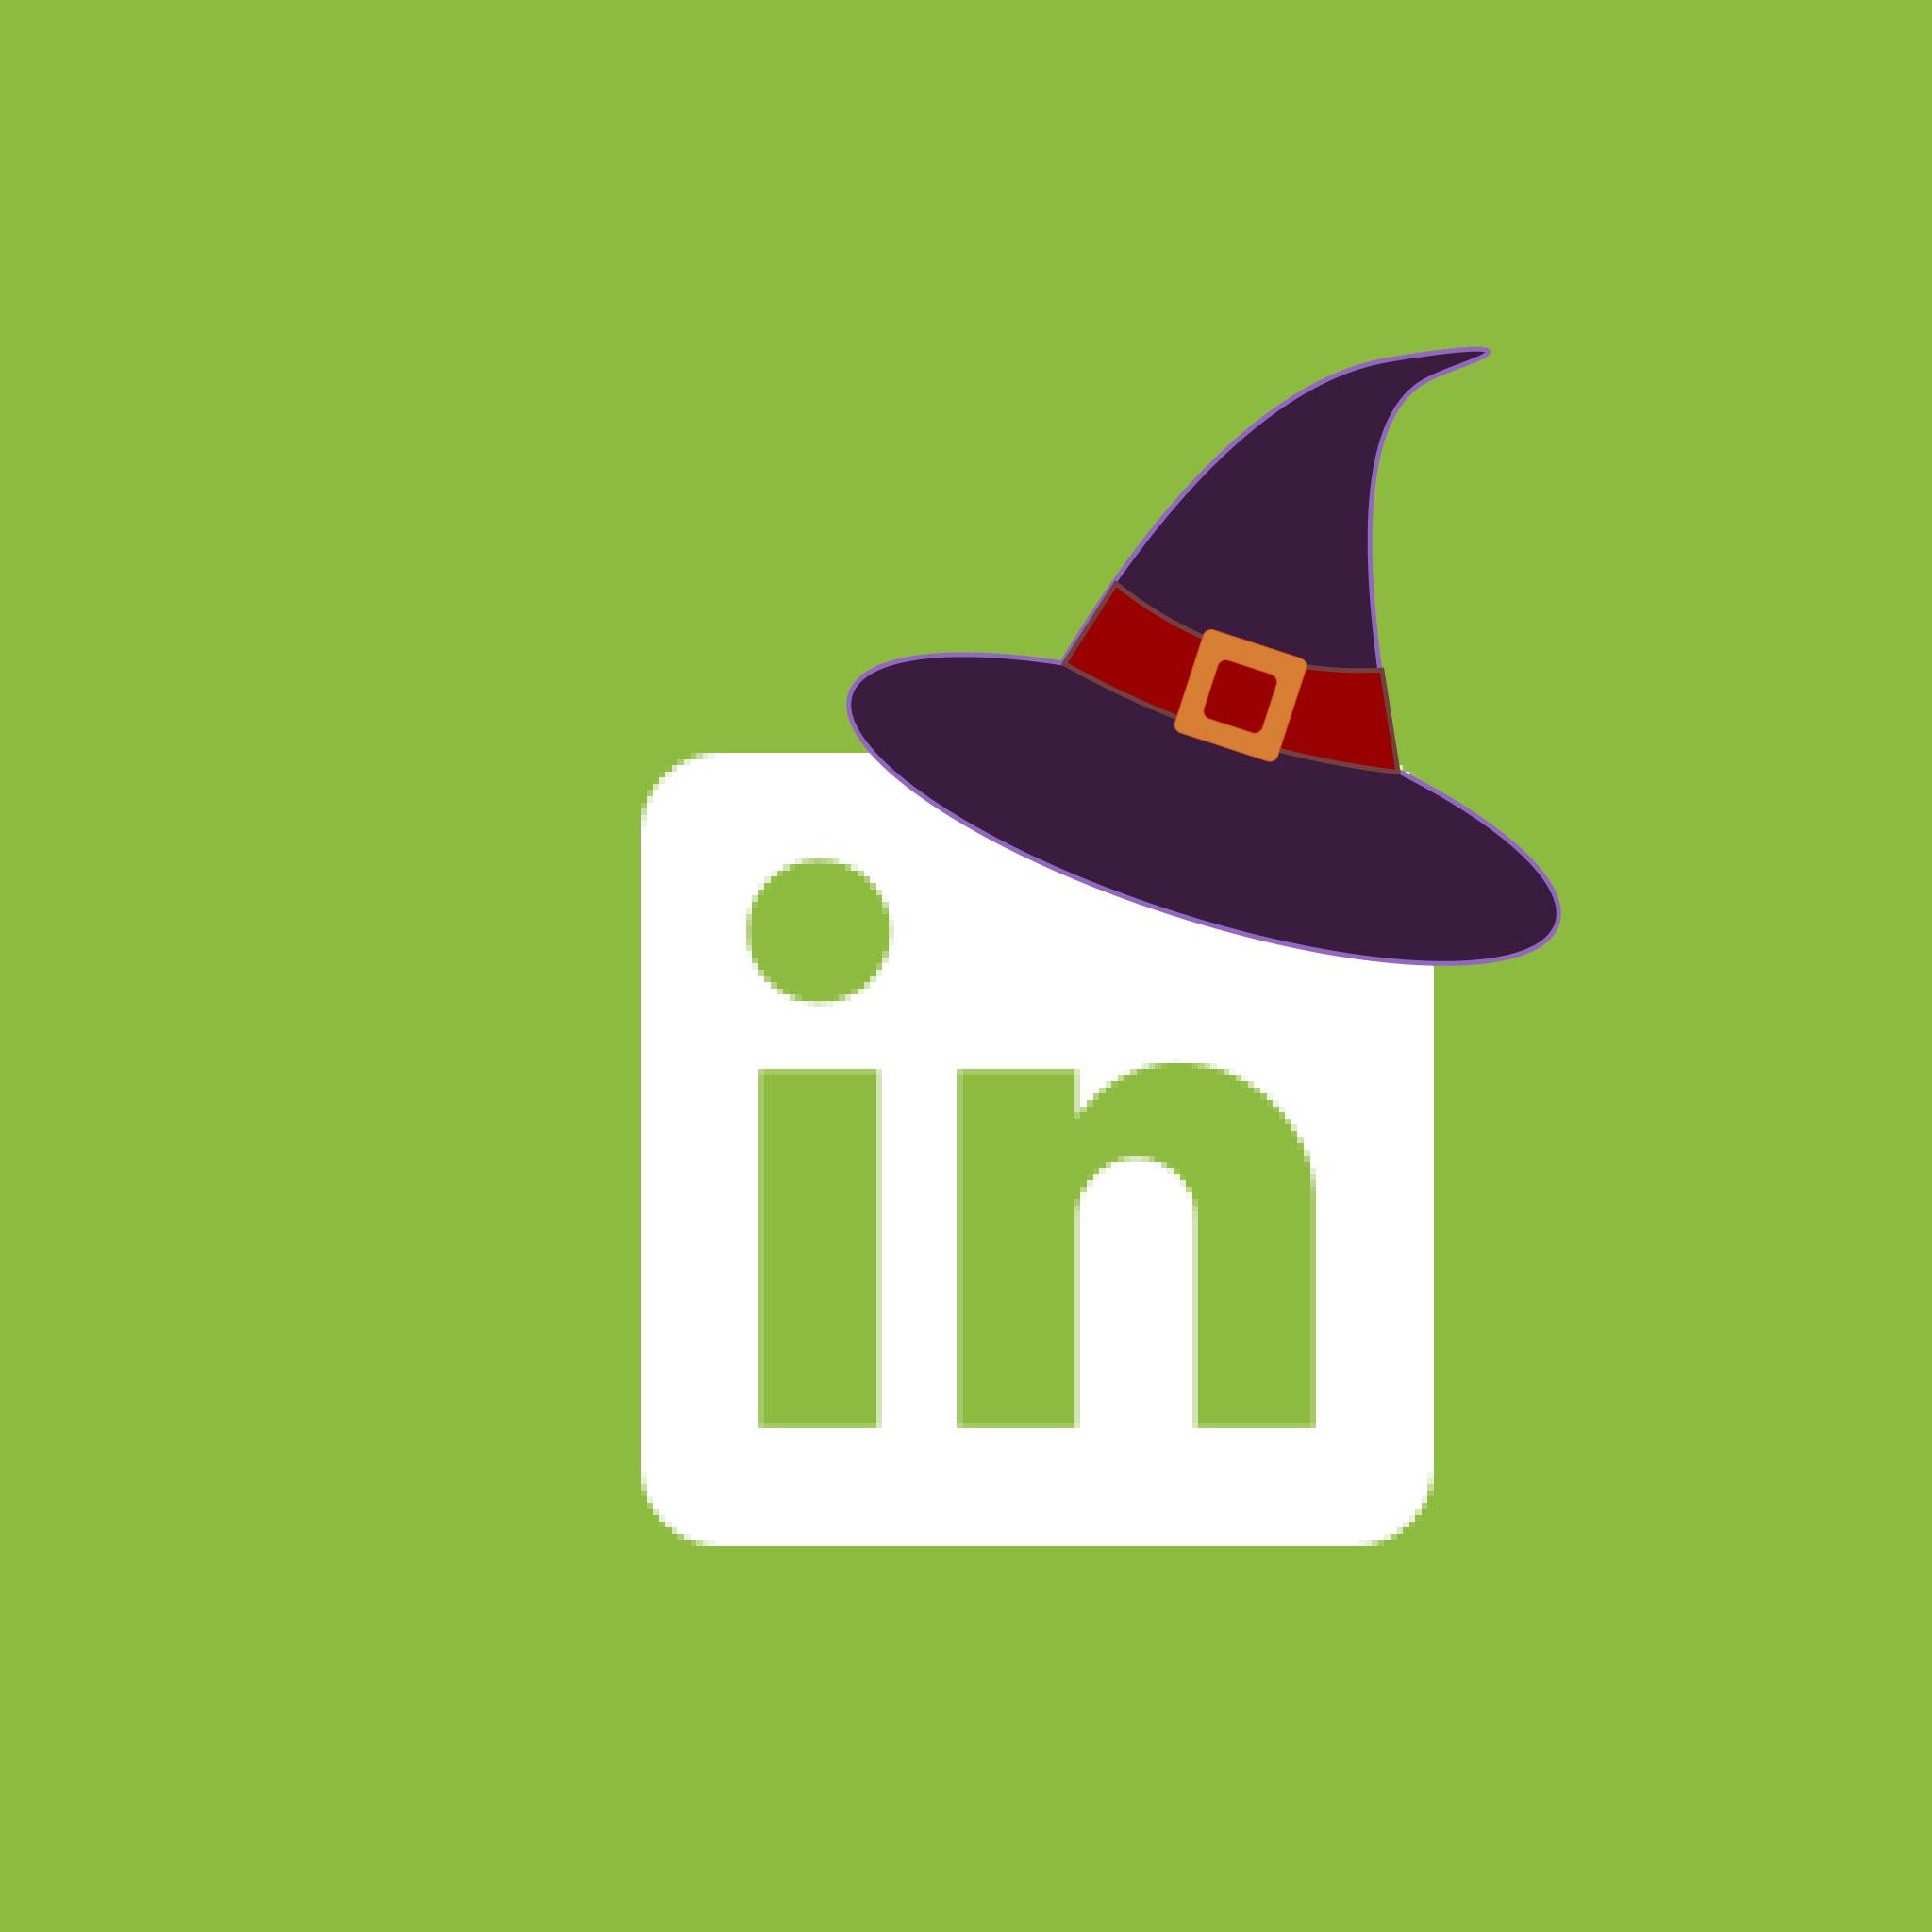 LinkedIn Halloween App Icon from HalloweenCostumes.com